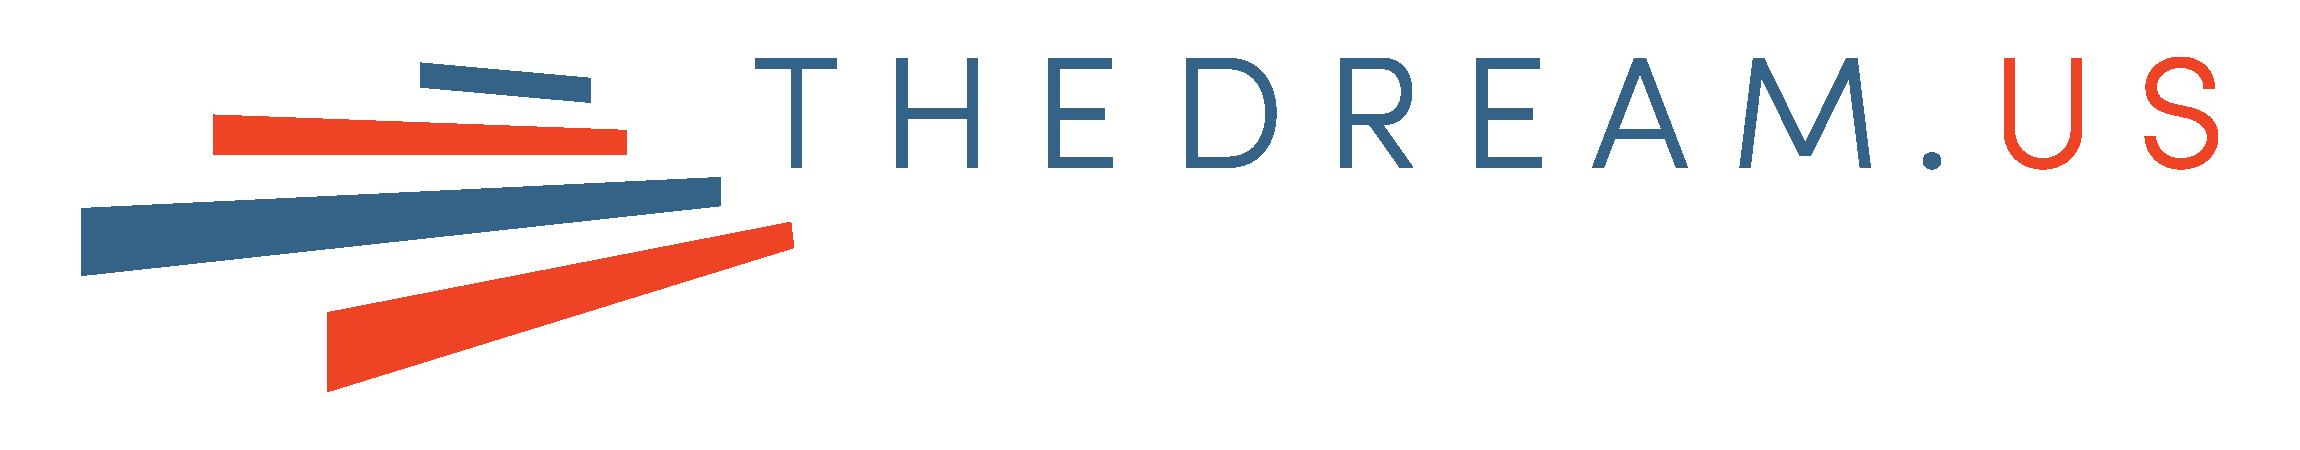 The Dream.US logo